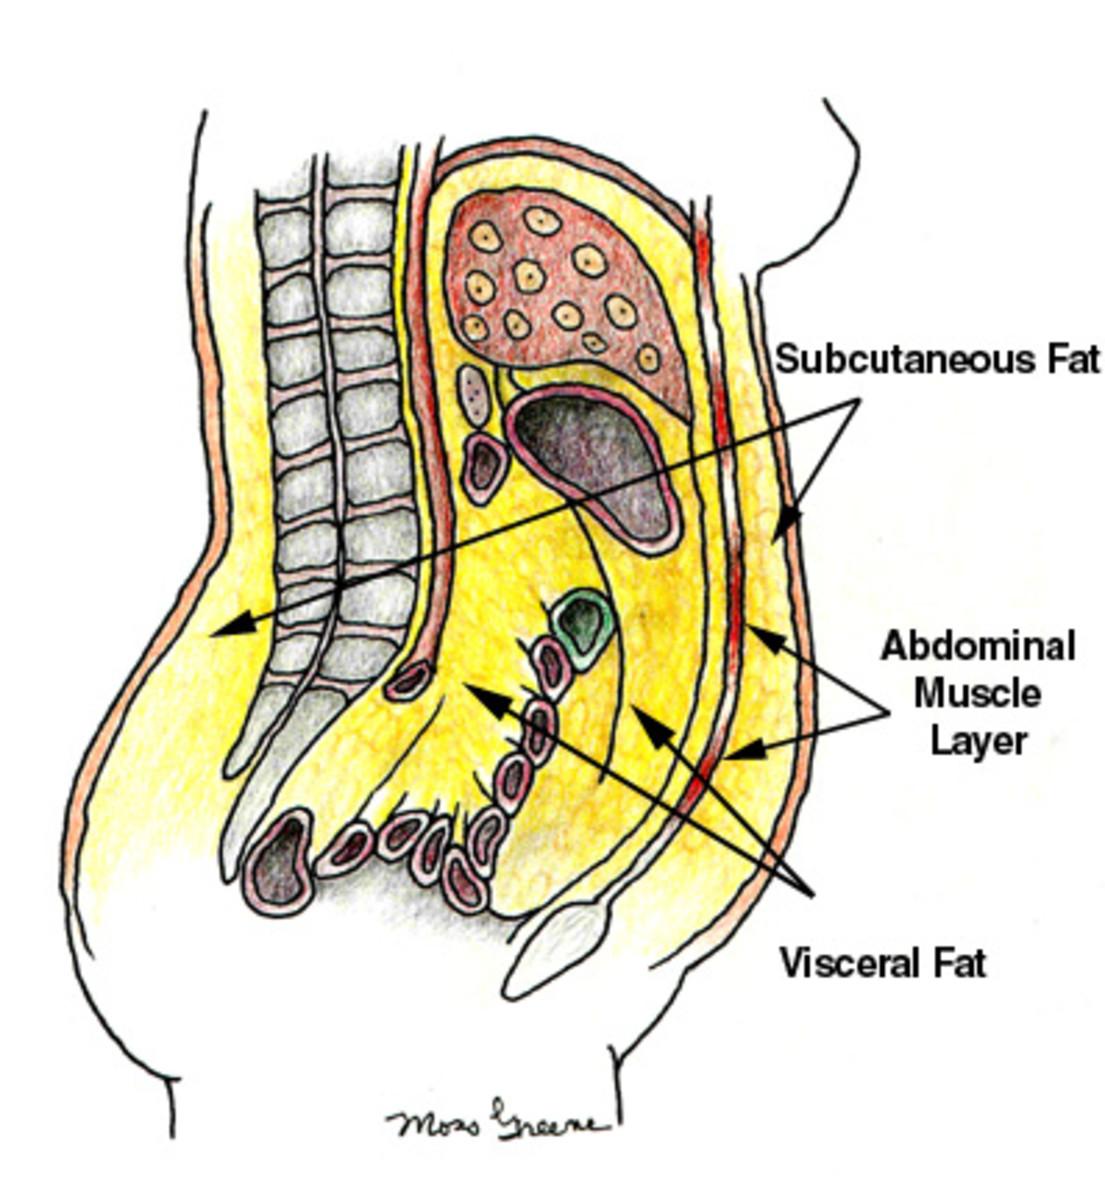 abdominal-obesity-metabolic-syndrome-aka-potbelly